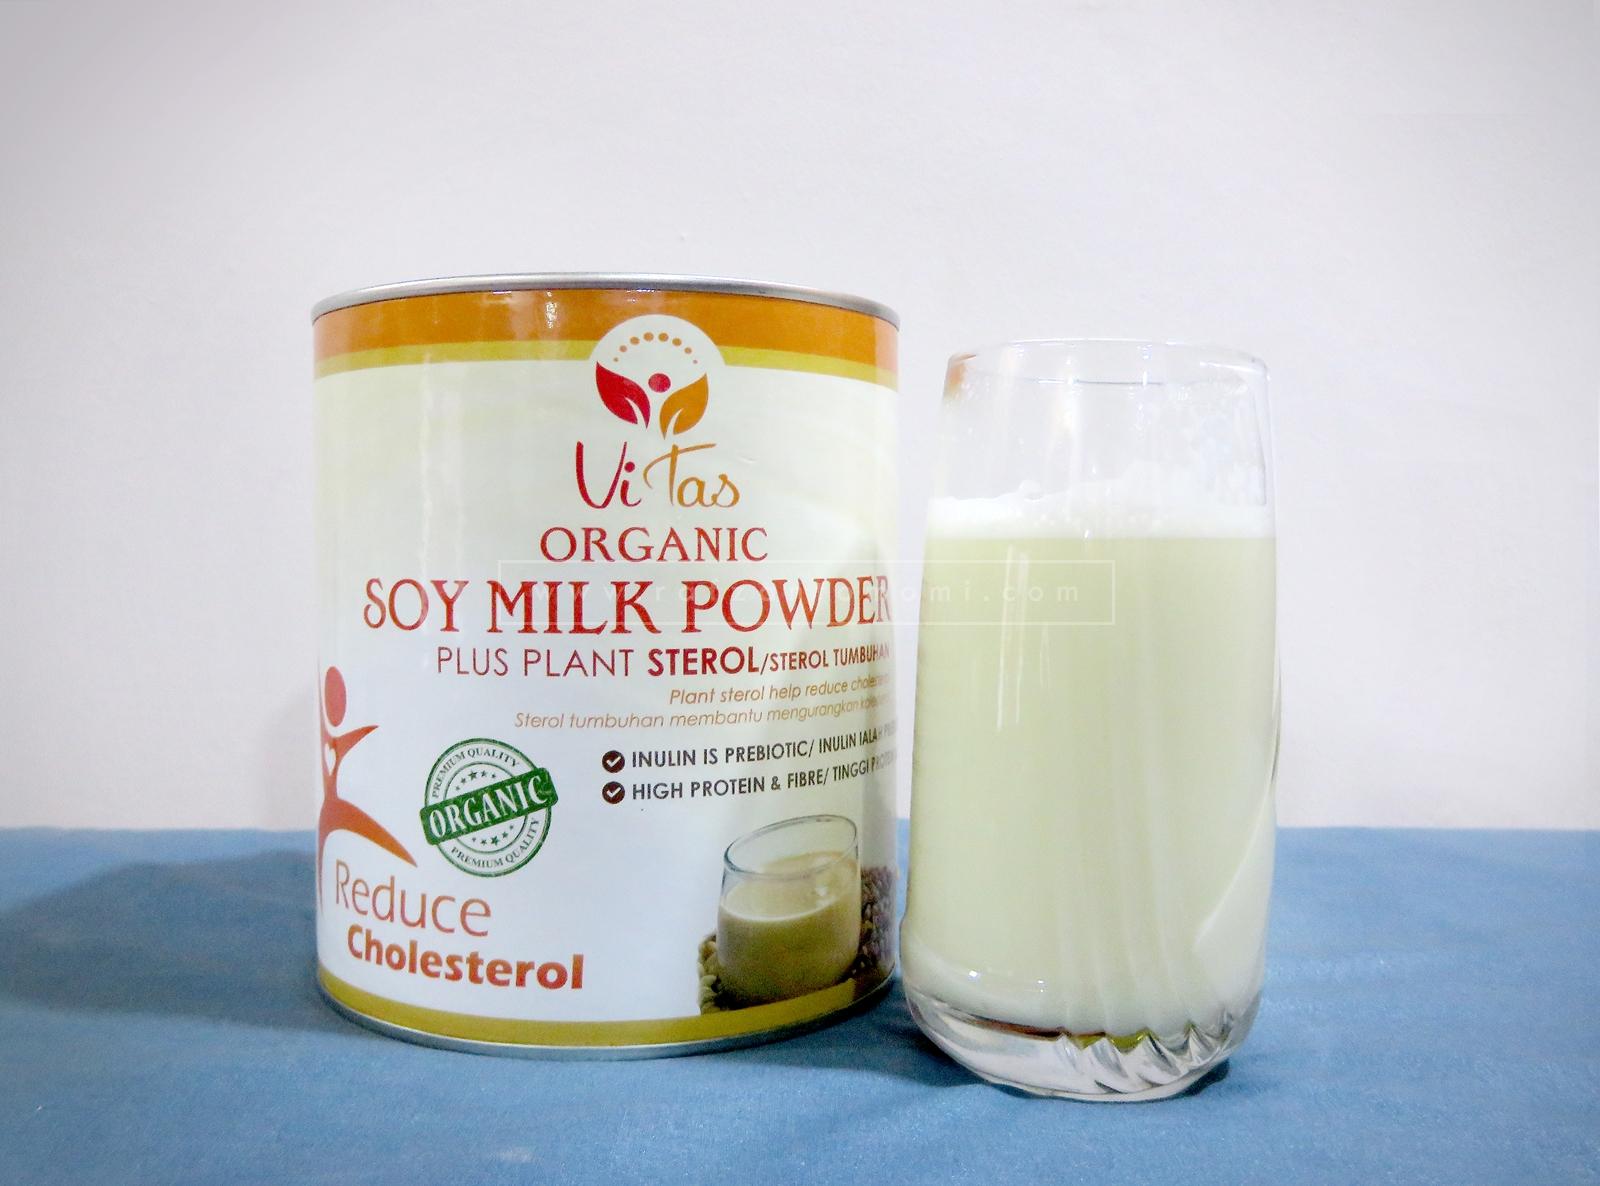 Kurangkan Kolestrol Dengan Vitas Organic Soymilk